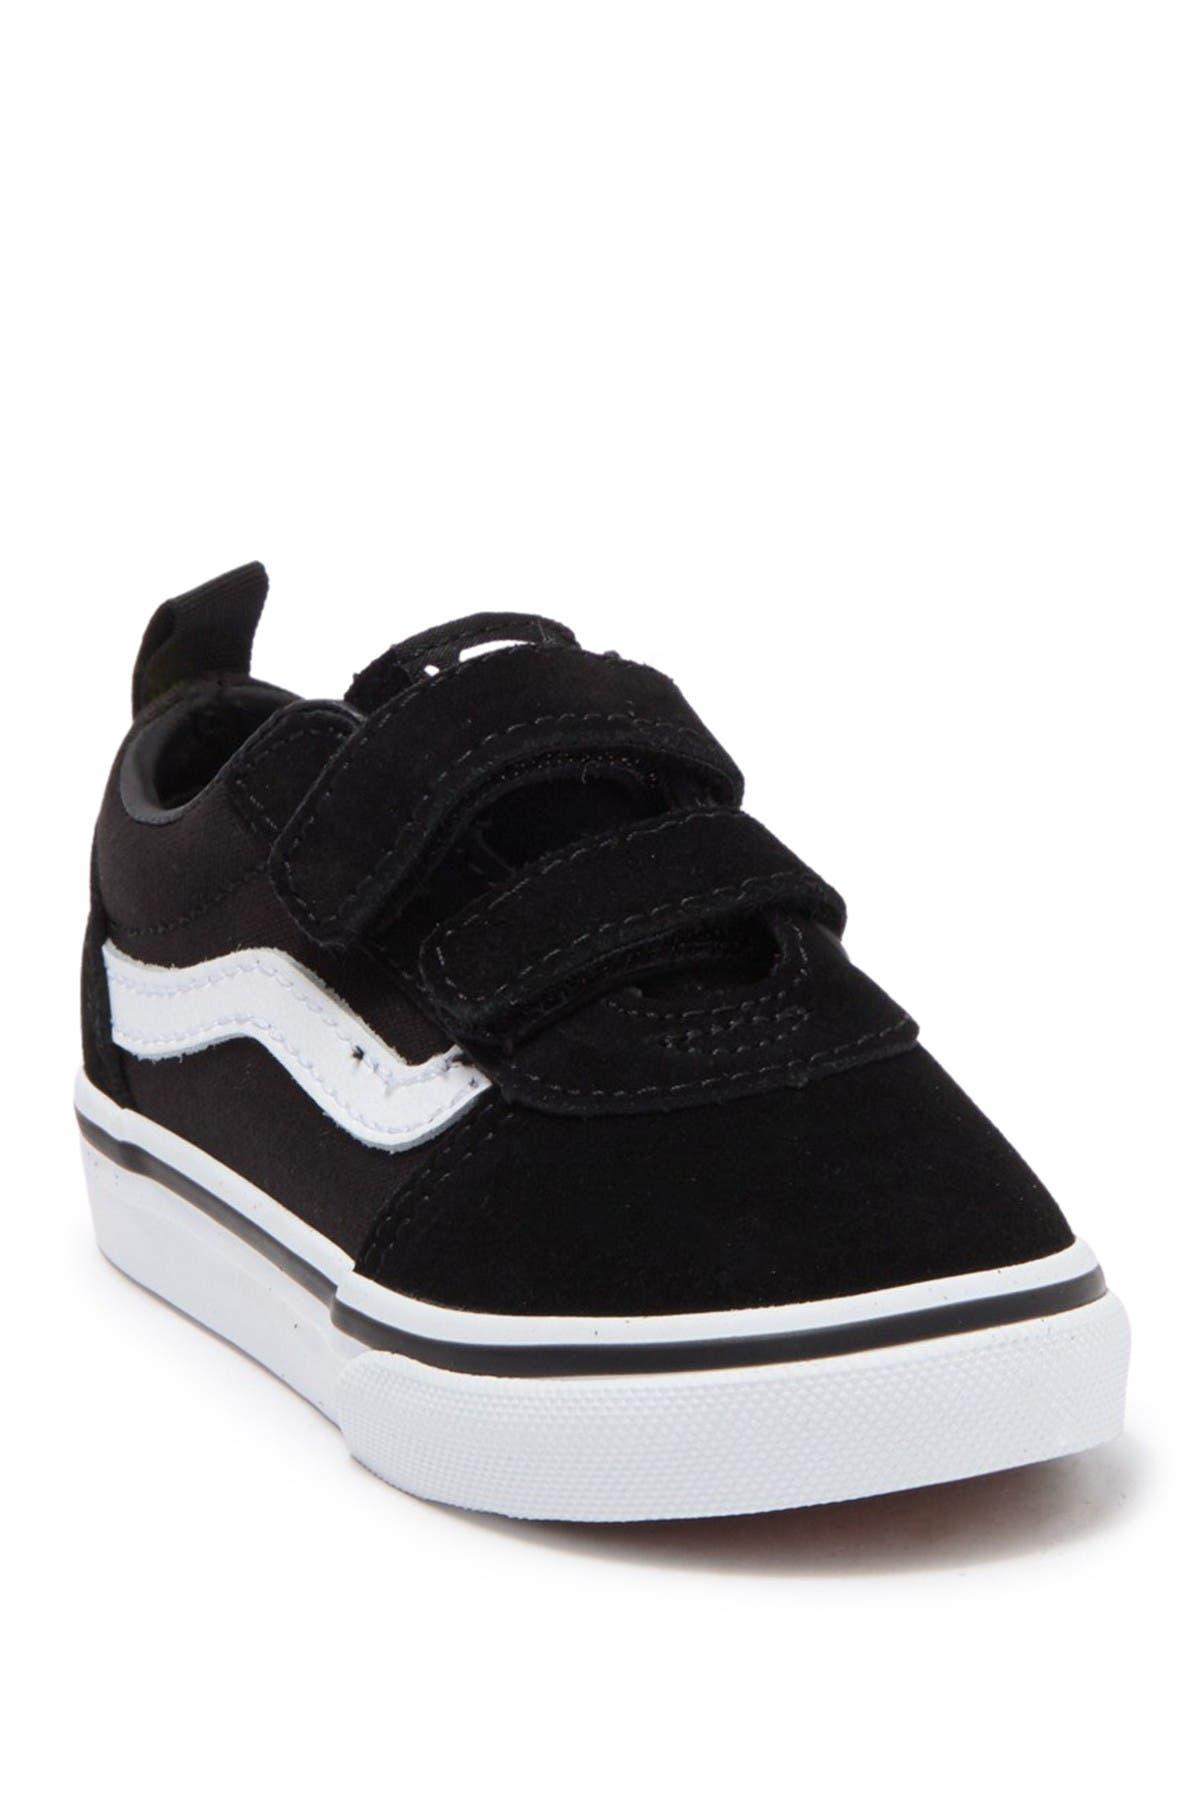 Image of VANS Ward Suede Canvas Sneaker